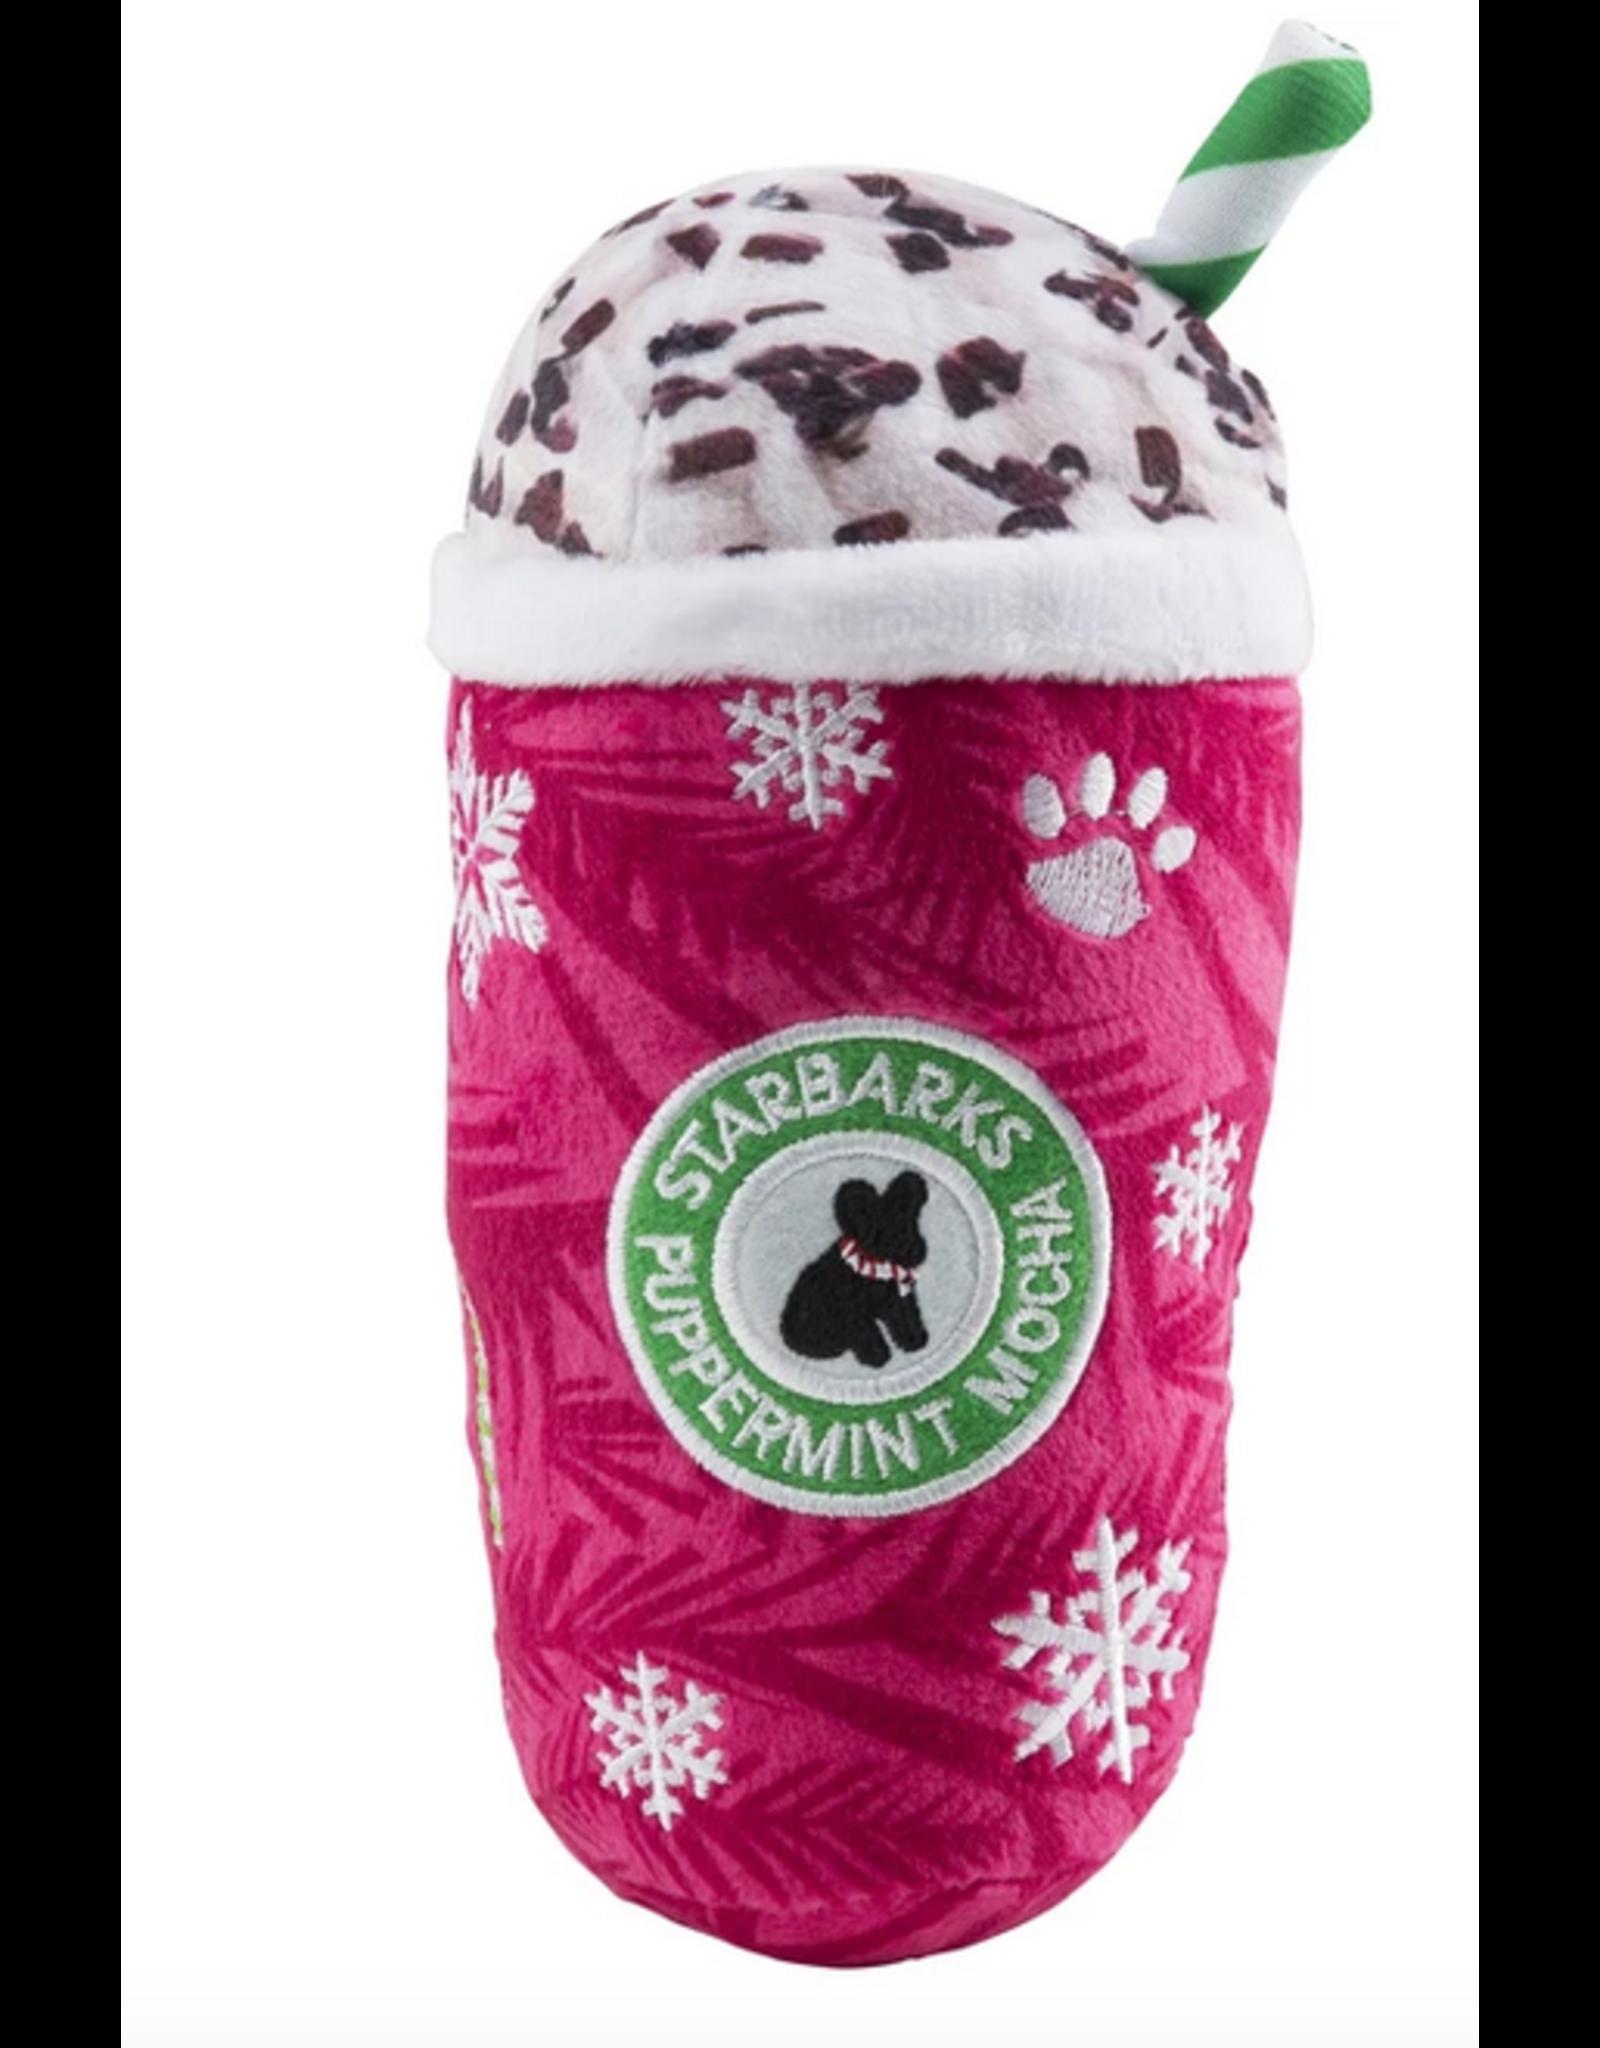 Haute Diggity Dog Starbucks Puppermint Mocha